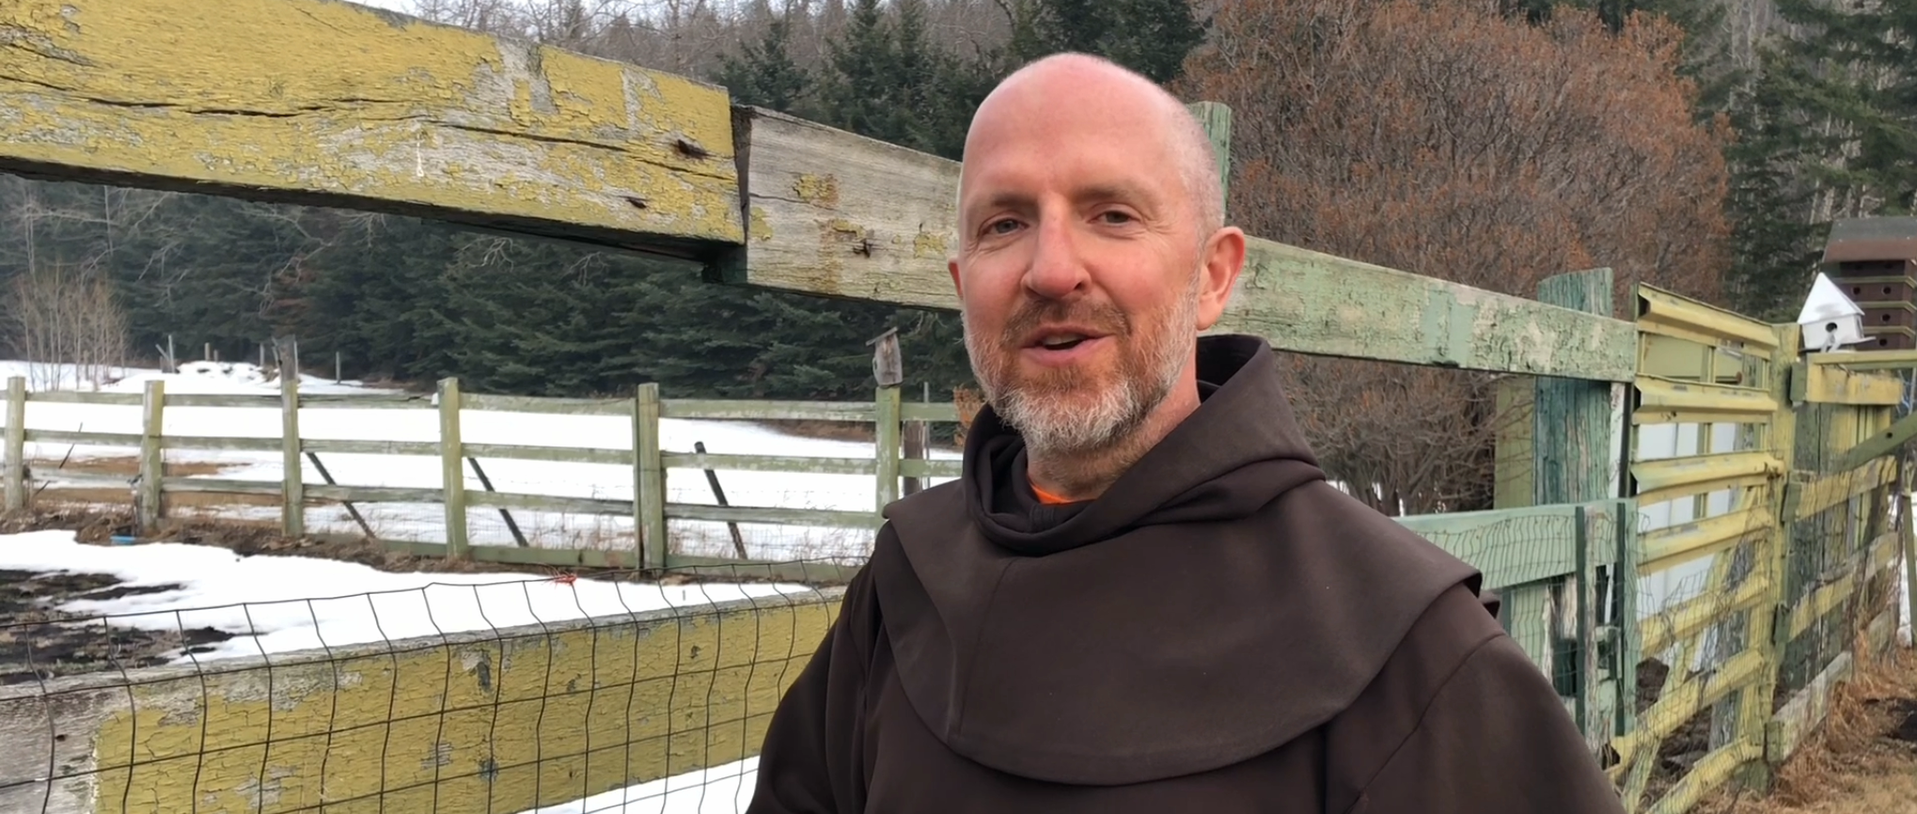 Frère Daniel Gurnick: Franciscain d'aujourd'hui